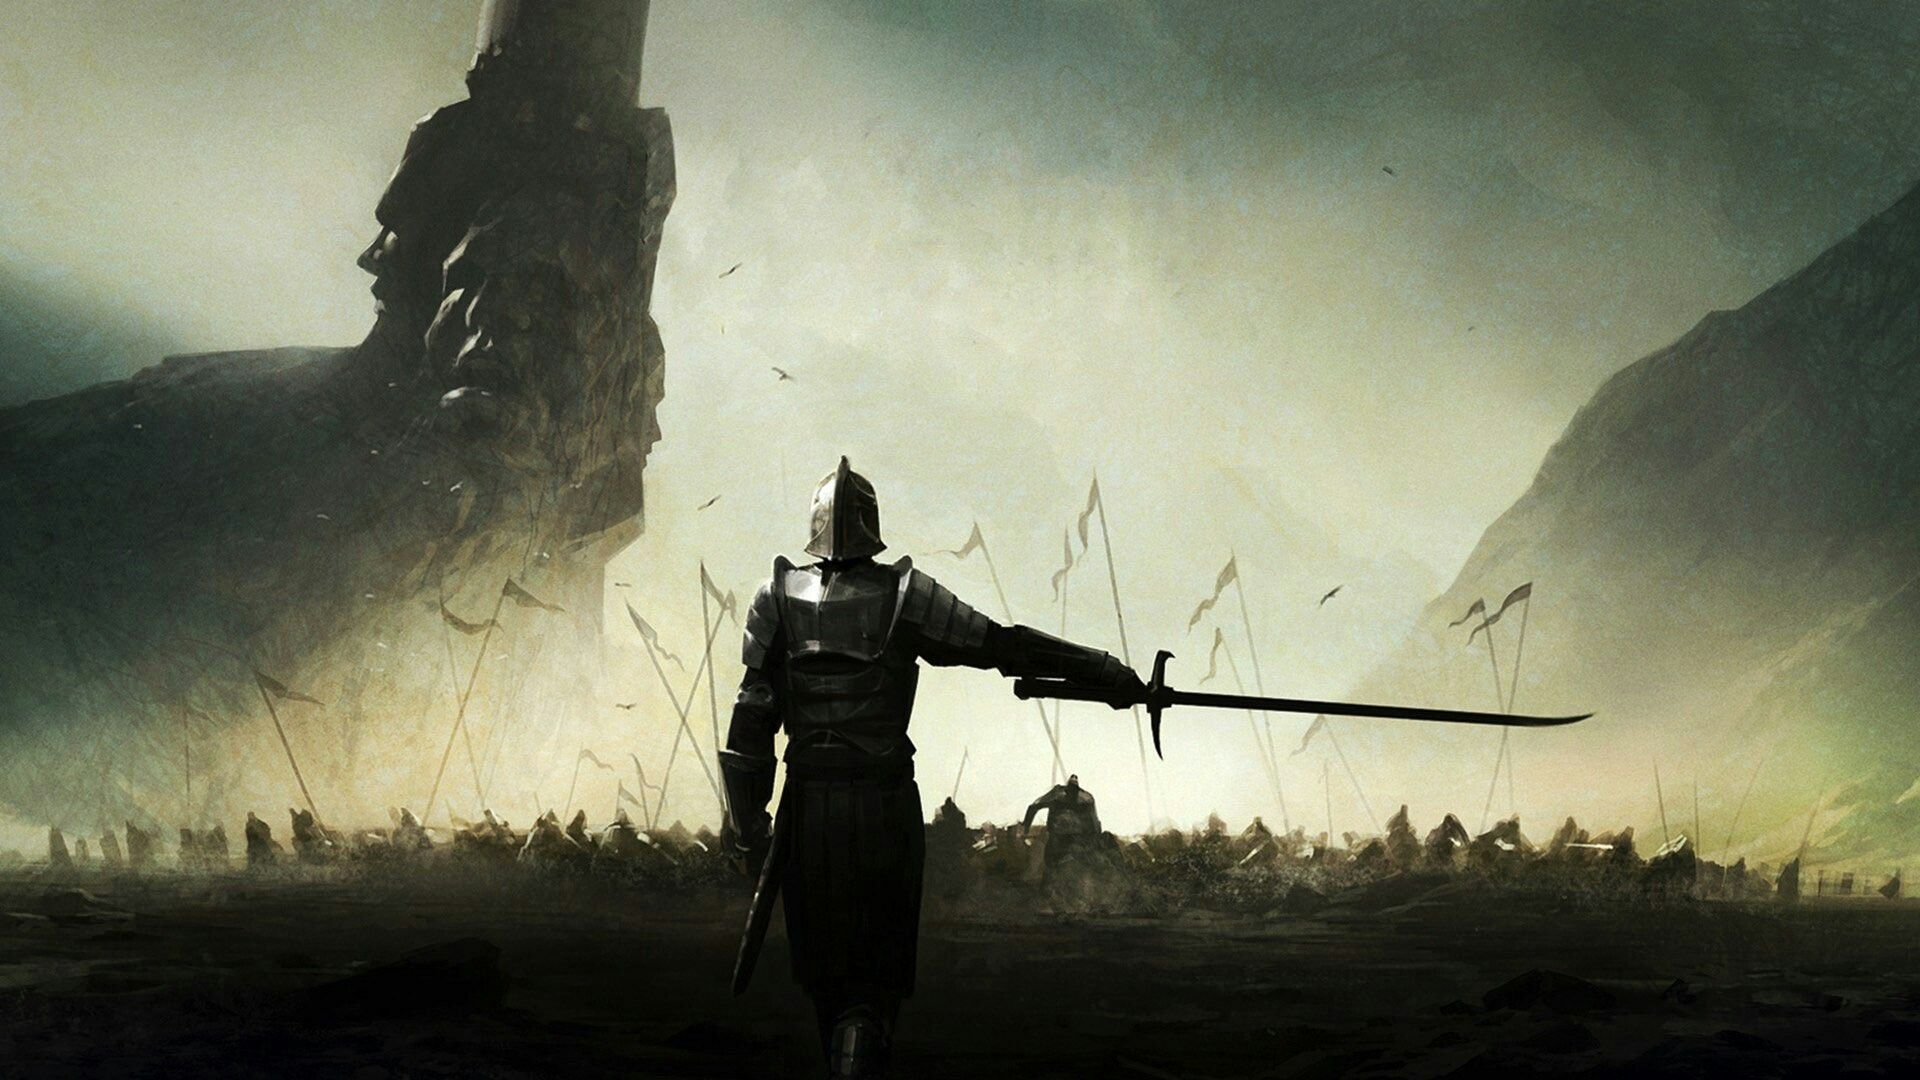 Sword Wallpapers Top Free Sword Backgrounds Wallpaperaccess